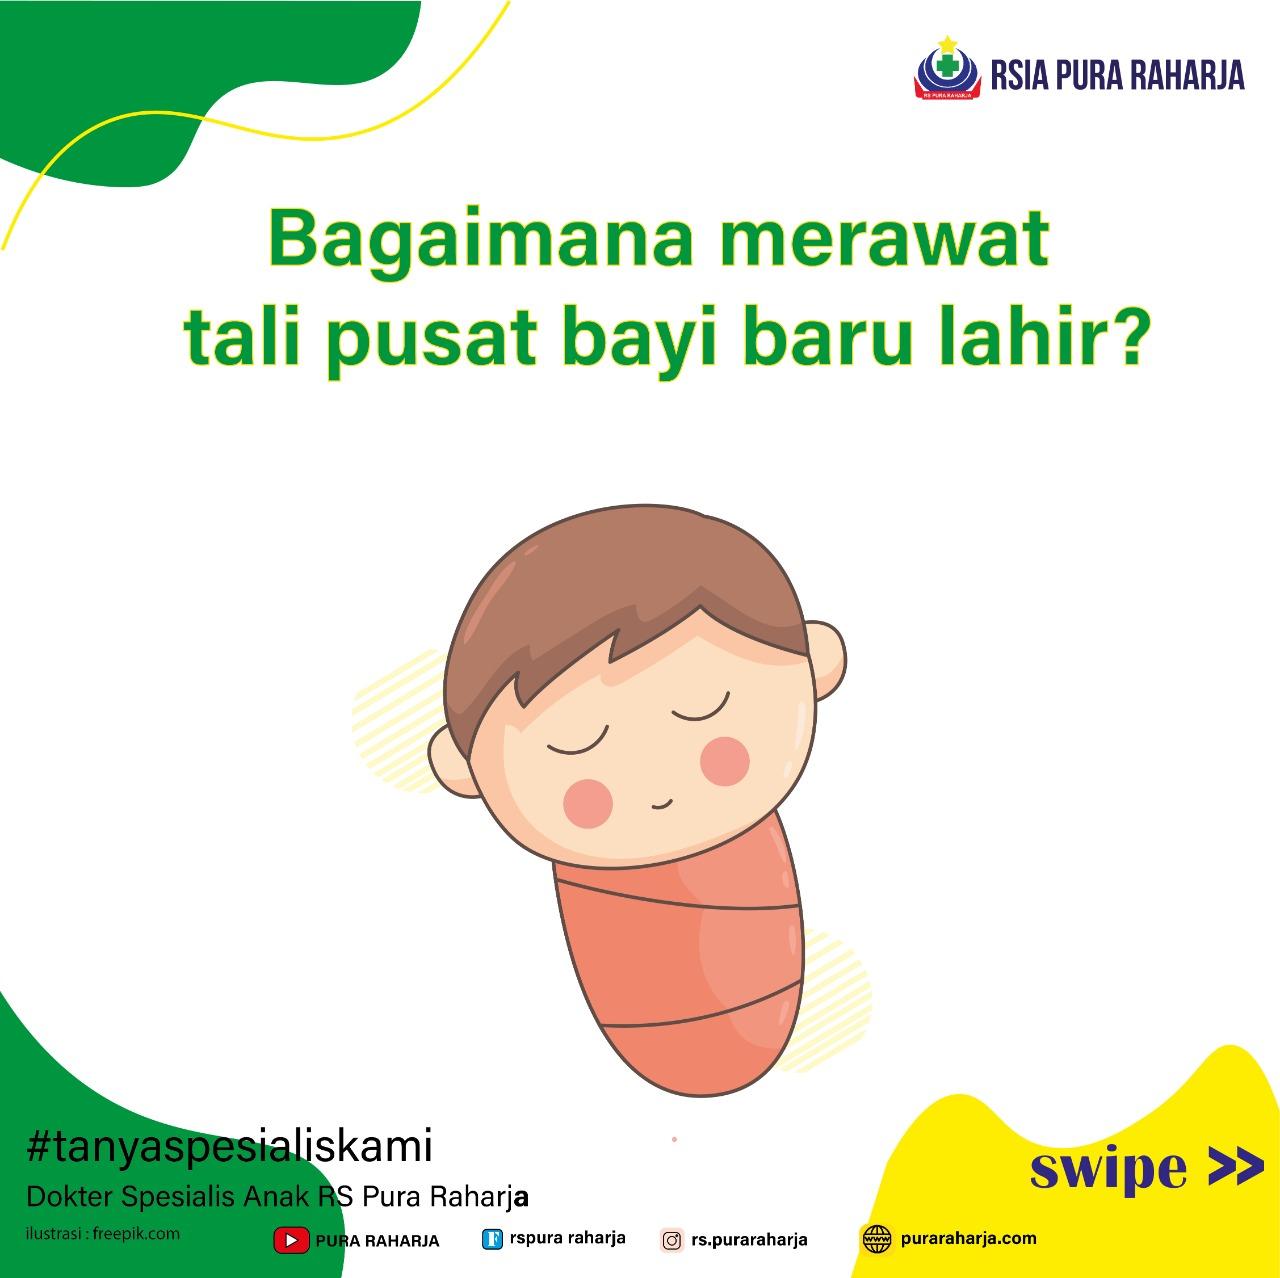 Merawat Tali Pusat Bayi Baru Lahir